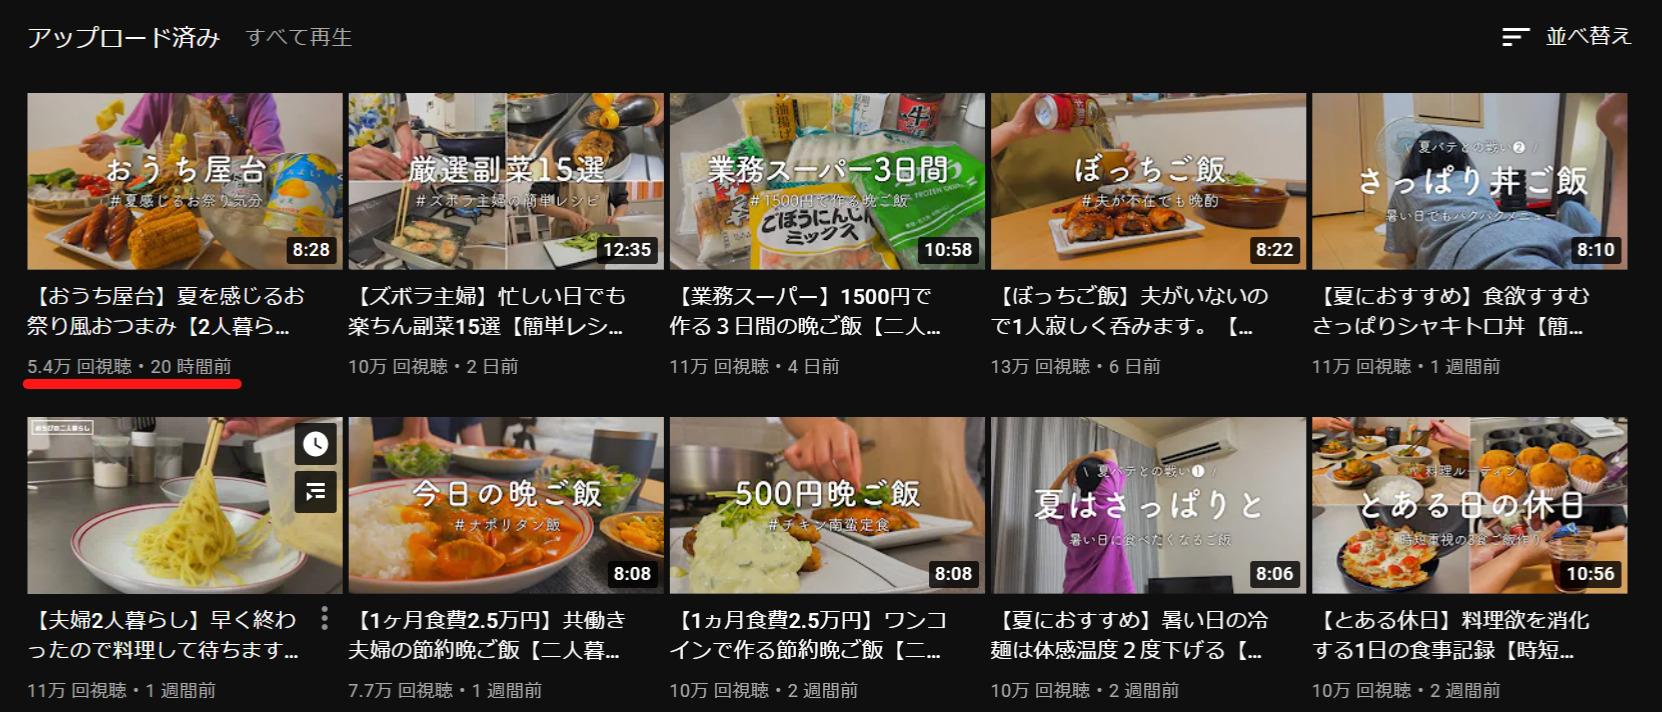 youtube-tibizu-new video-views